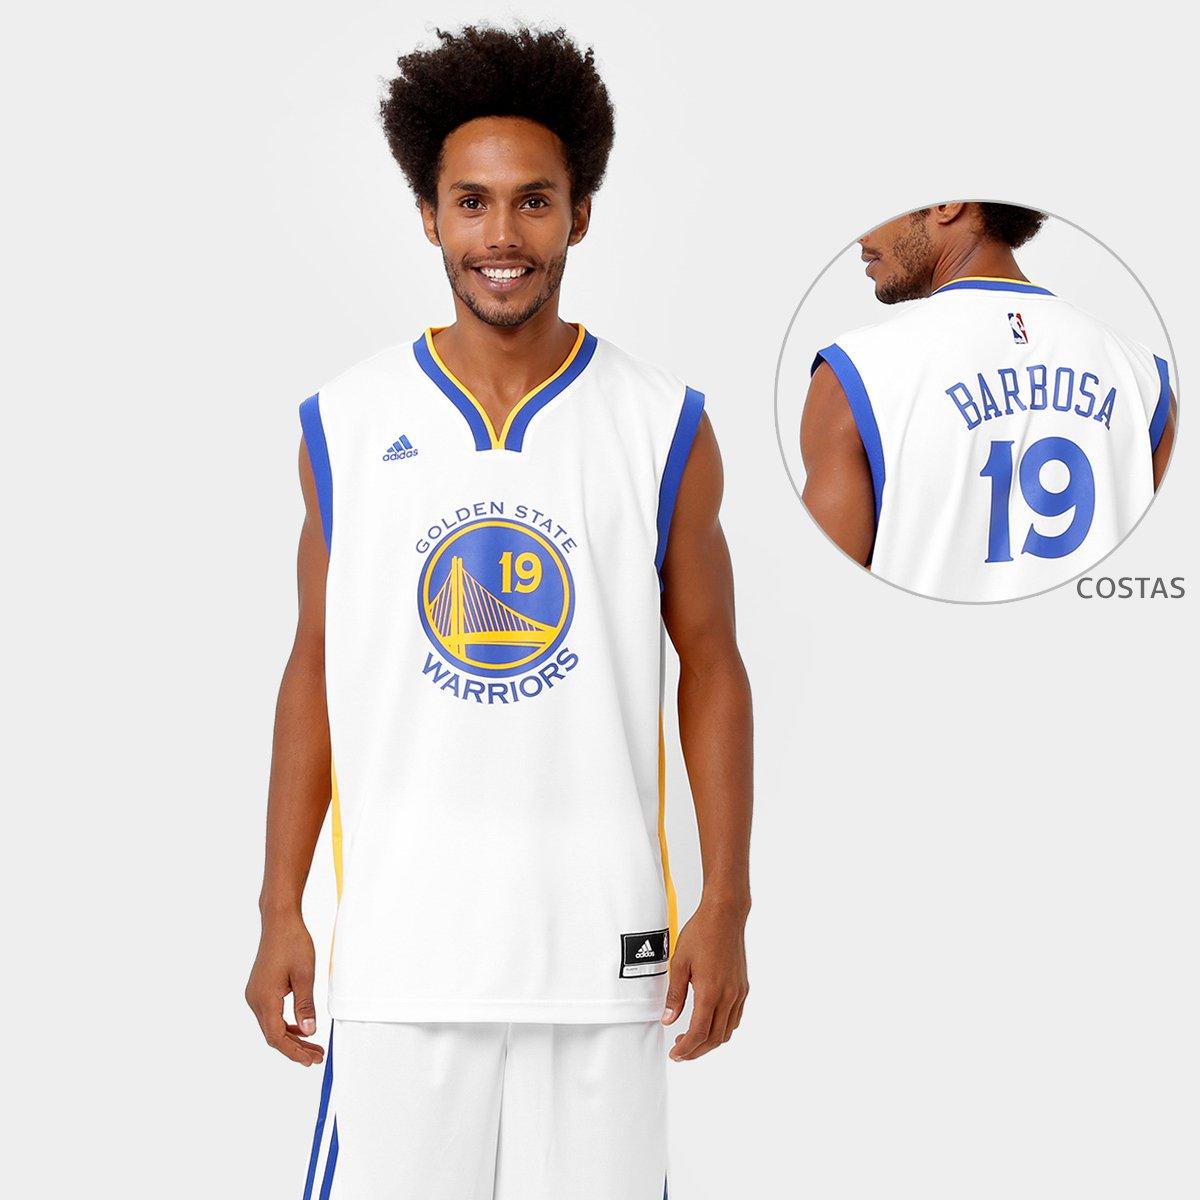 Camiseta Regata Adidas NBA Golden State Warriors - Barbosa - Compre ... 7ffc0b661648e